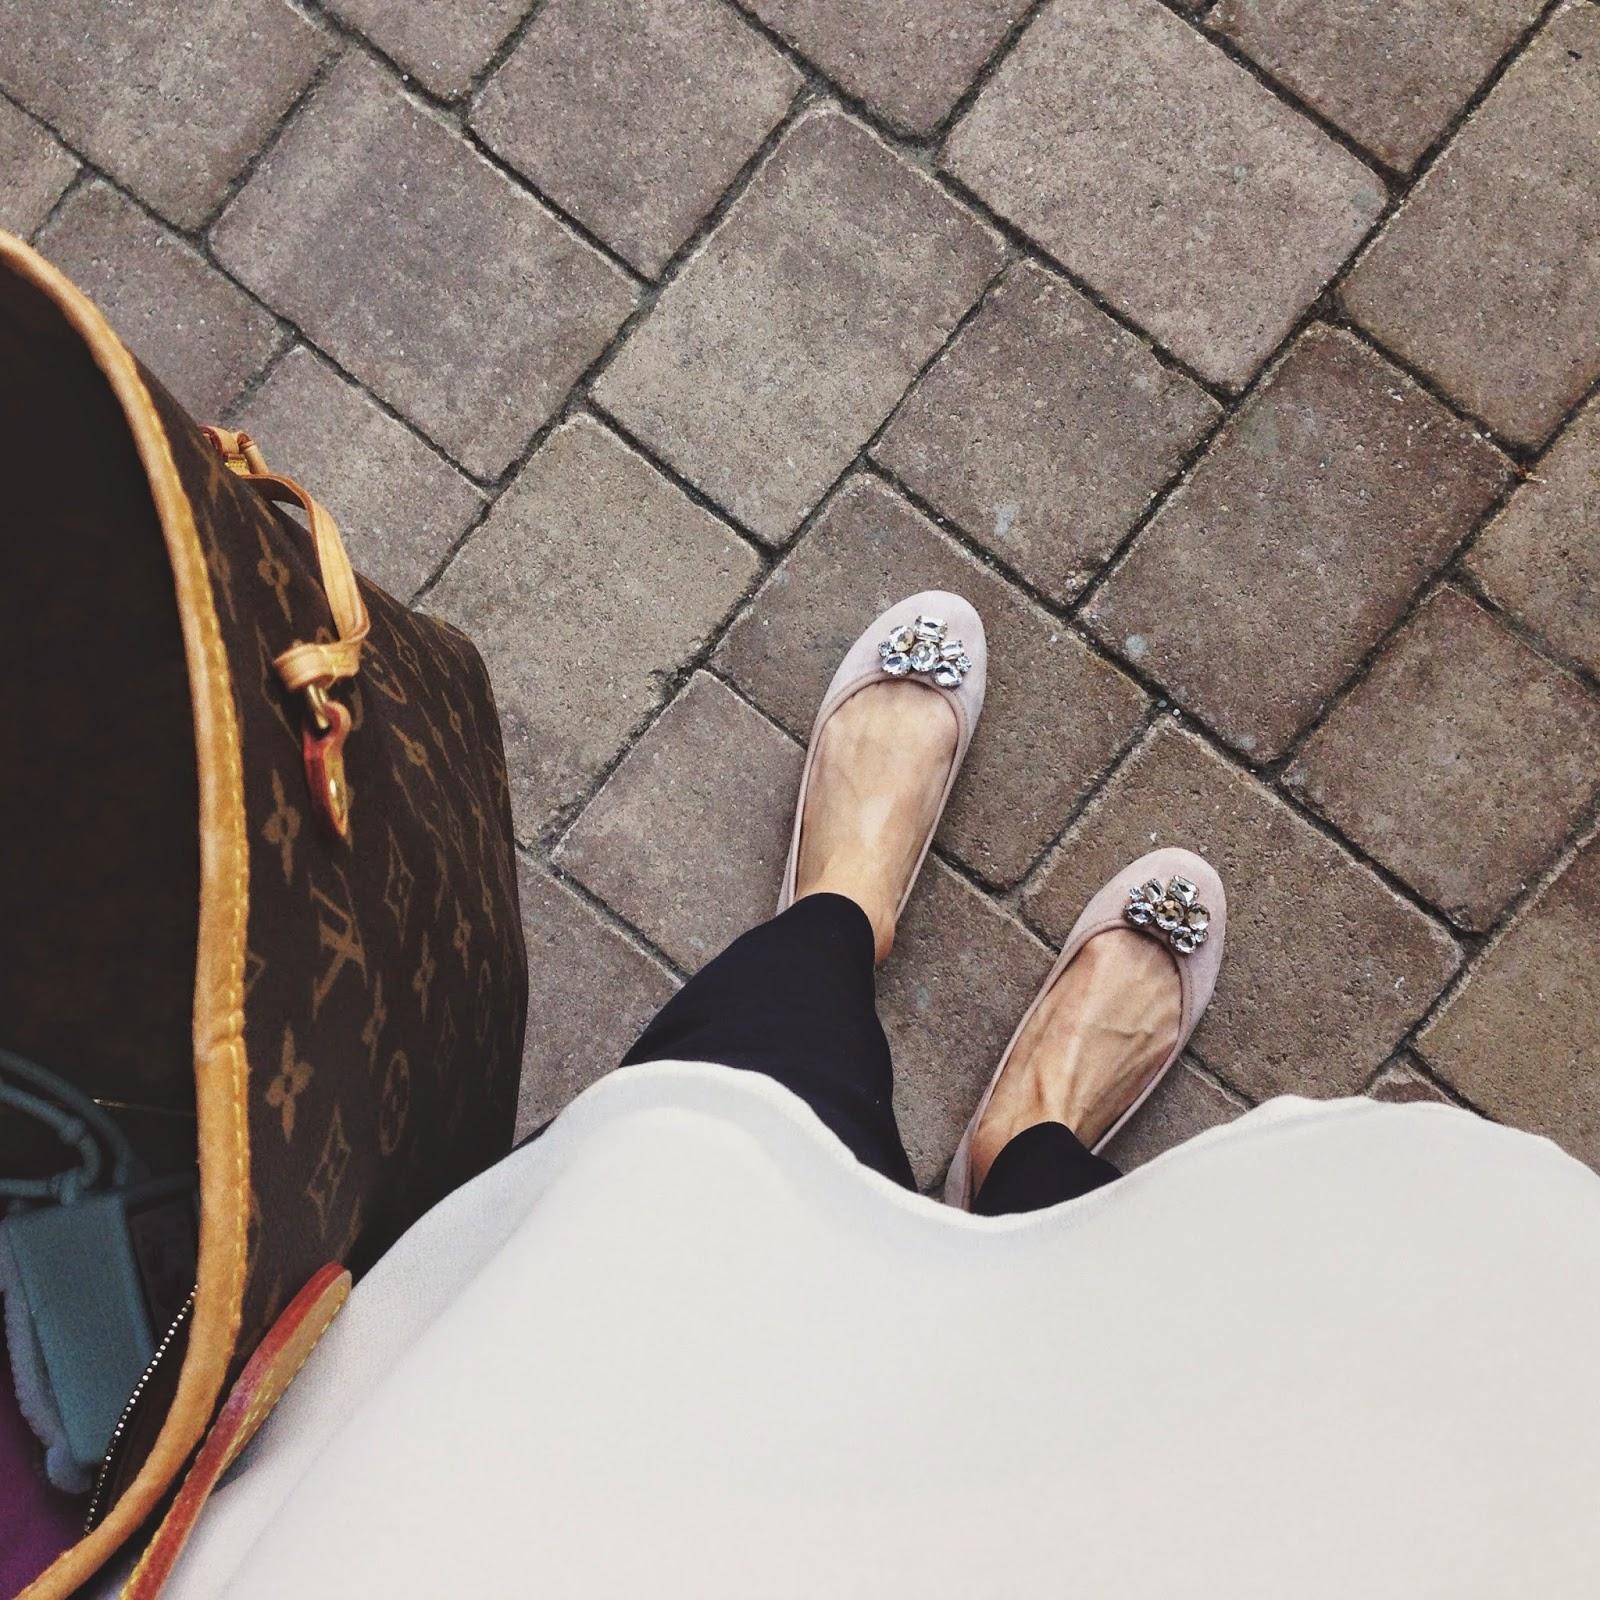 Lily Pulitzer Starbucks The Beauty Of Instagram Pardon Muah